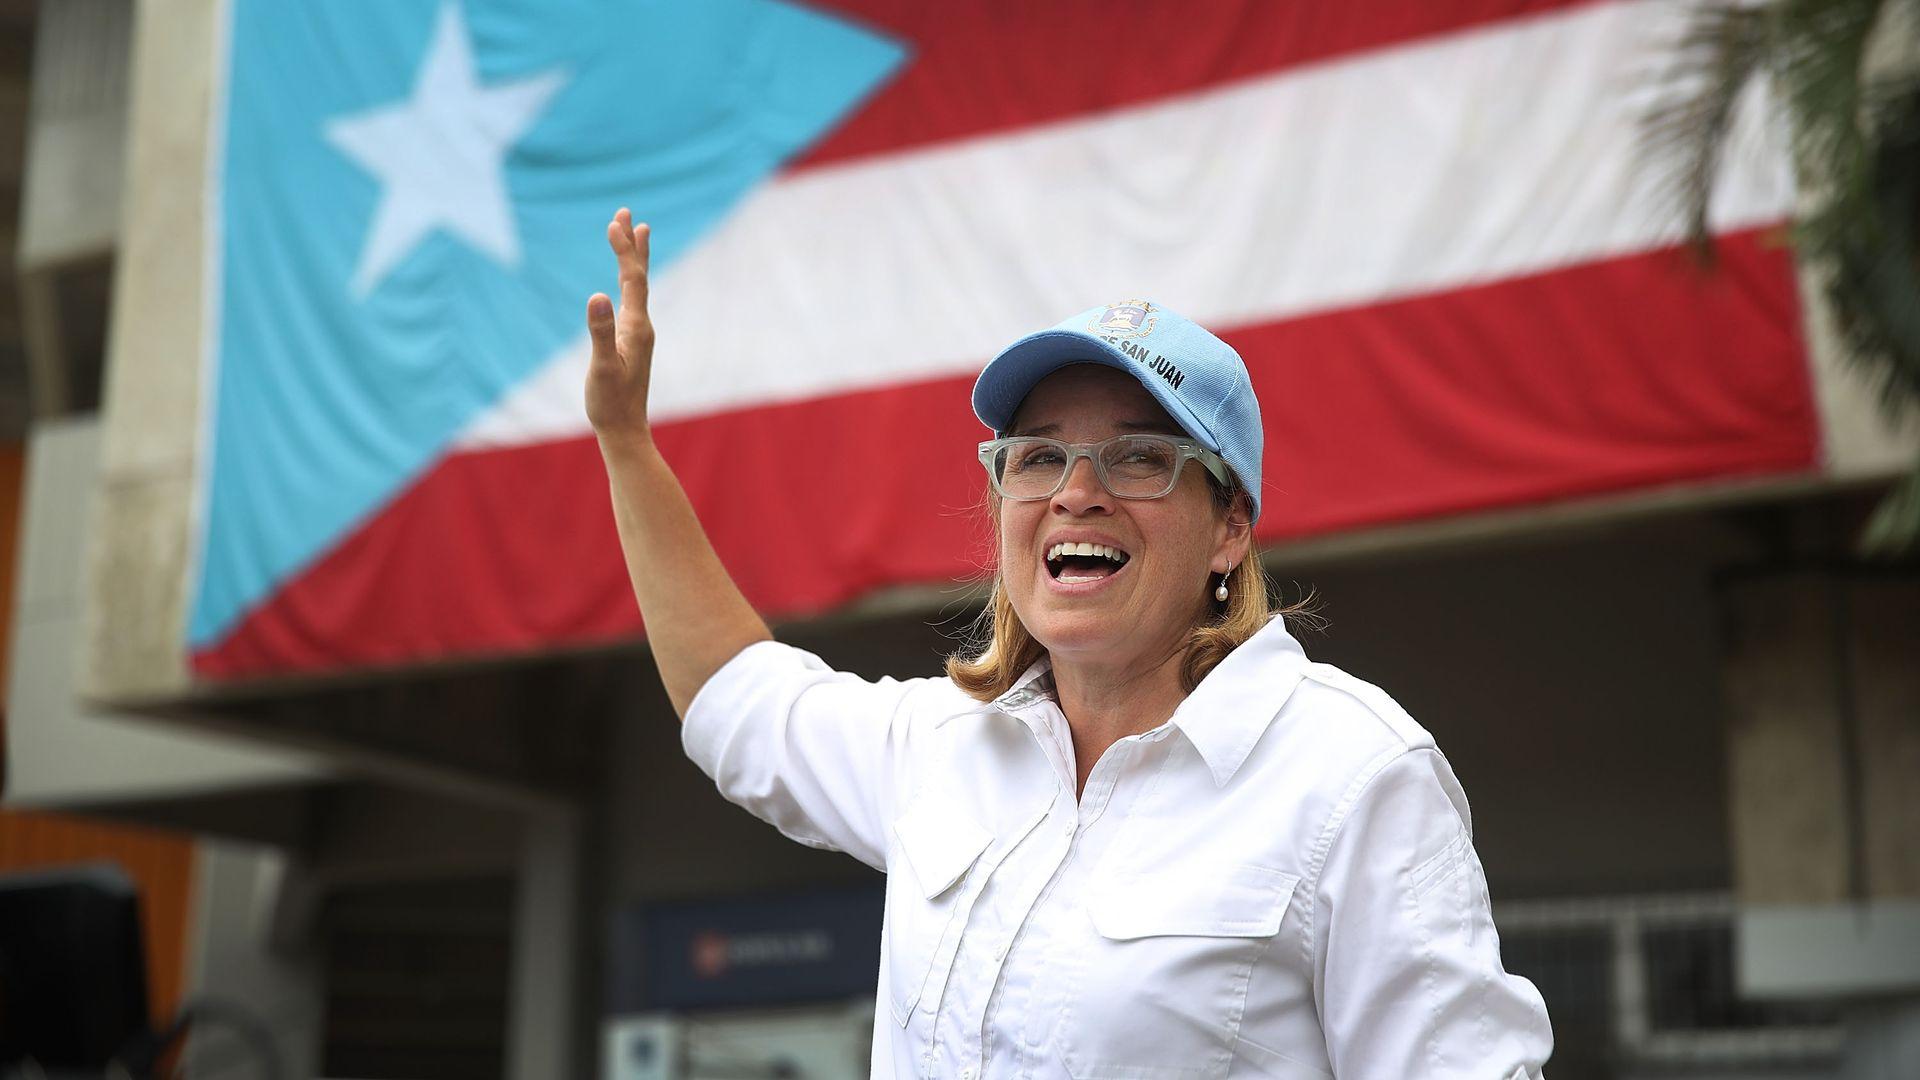 Trump critic and San Juan mayor announces run for Puerto Rico's governor